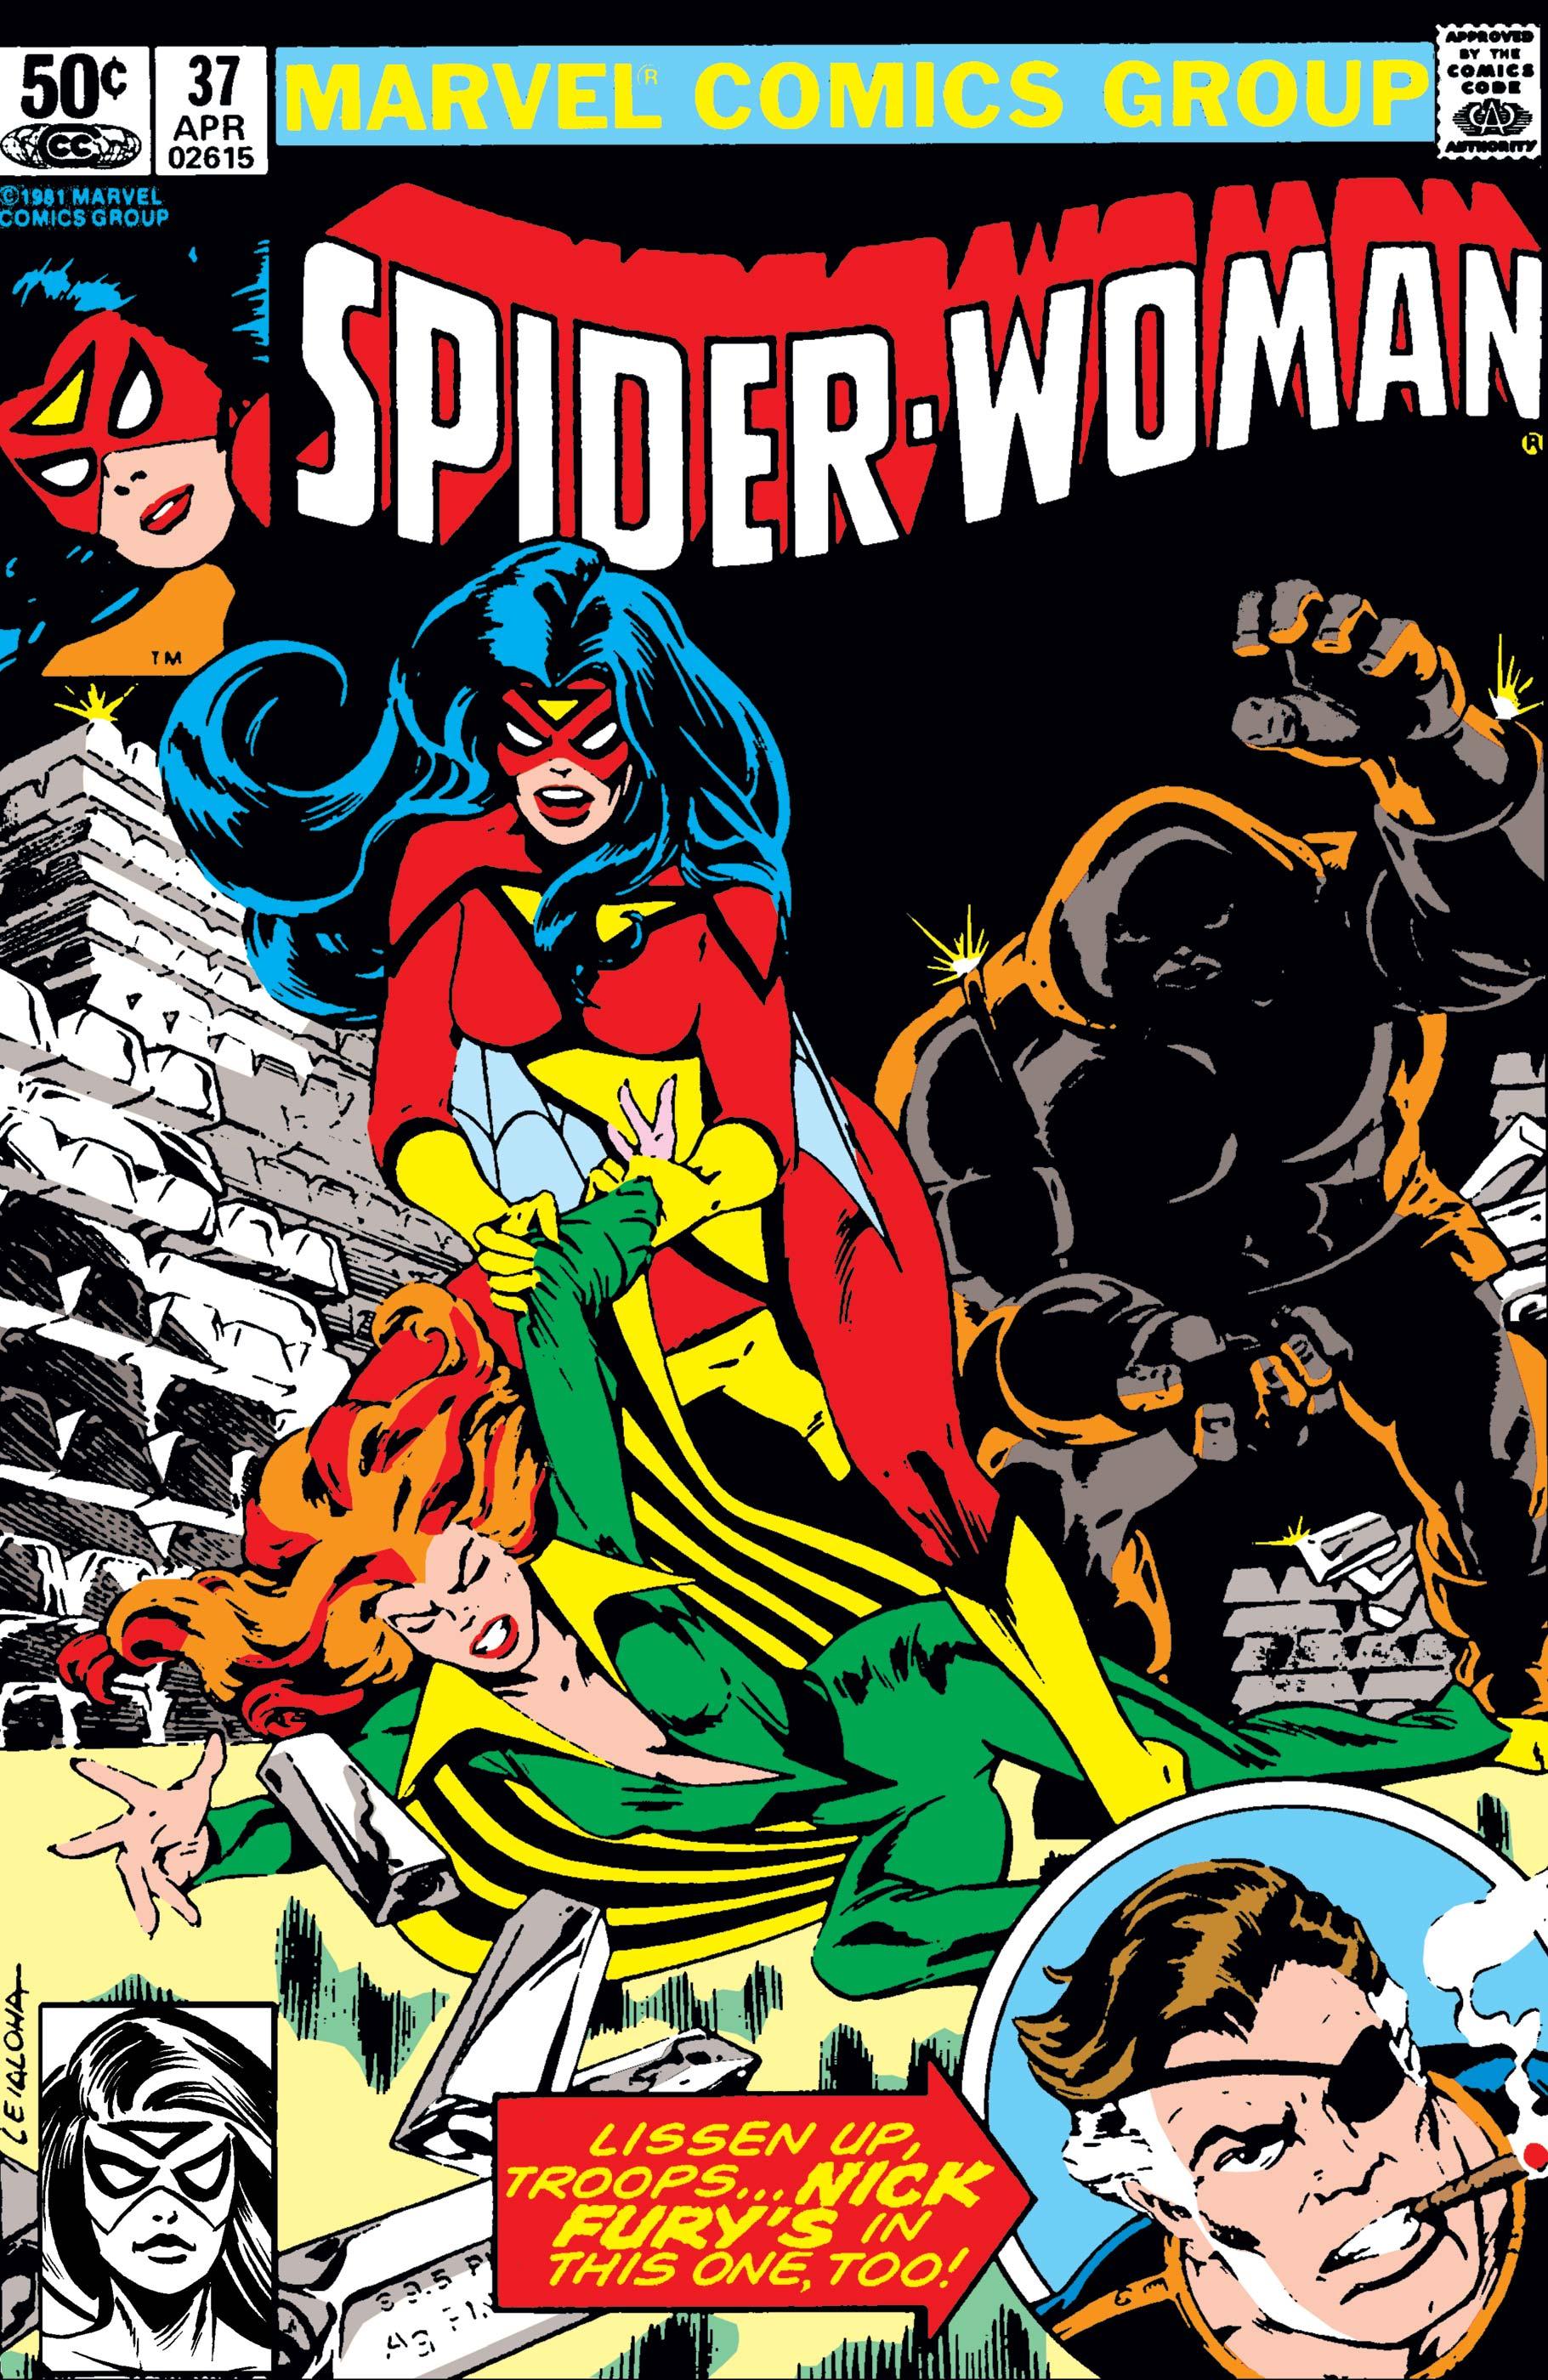 Spider-Woman Vol 1 37.jpg